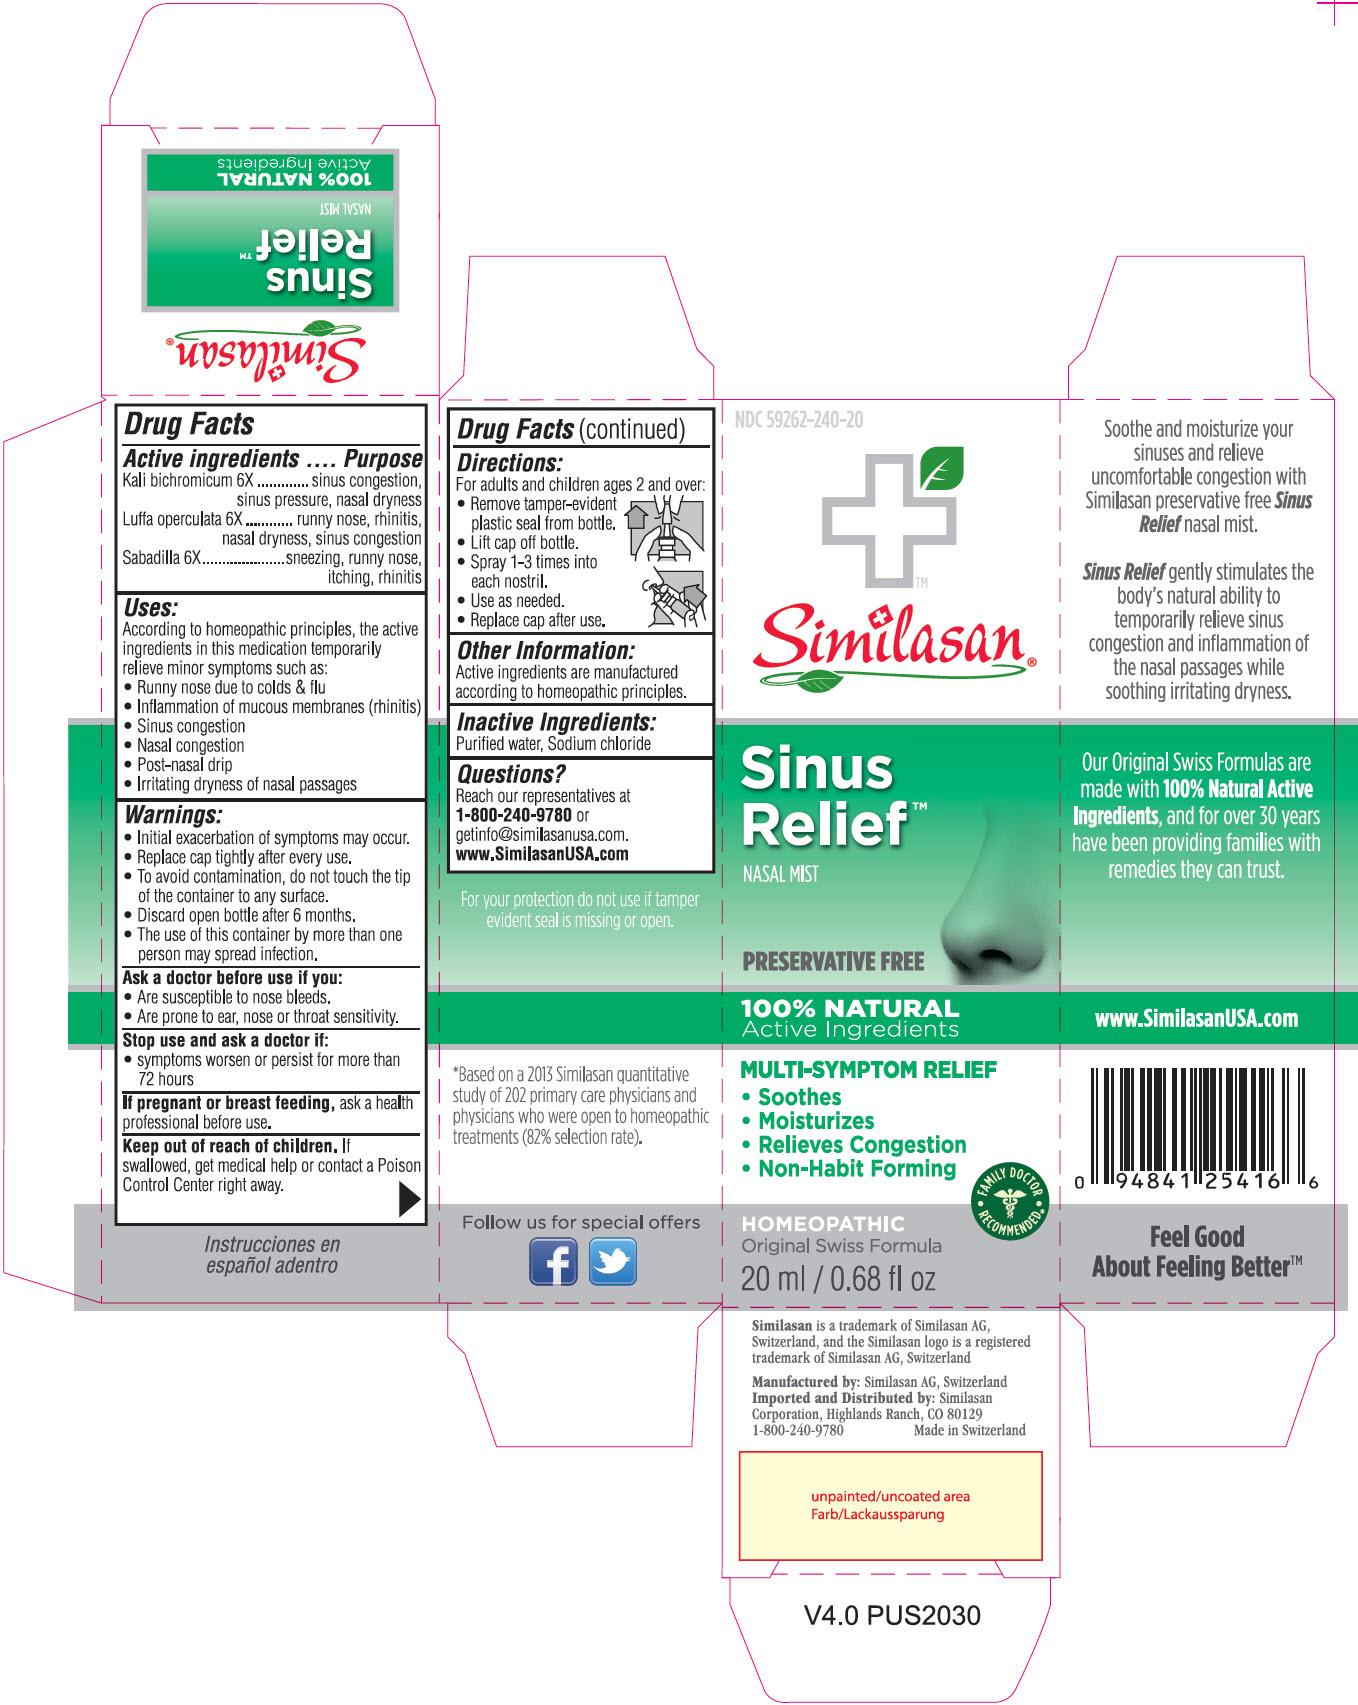 NDC: <a href=/NDC/59262-240-20>59262-240-20</a> Similasan Sinus Relief NASAL MIST PRESERVATIVE FREE 20 ml / 0.68 fl oz